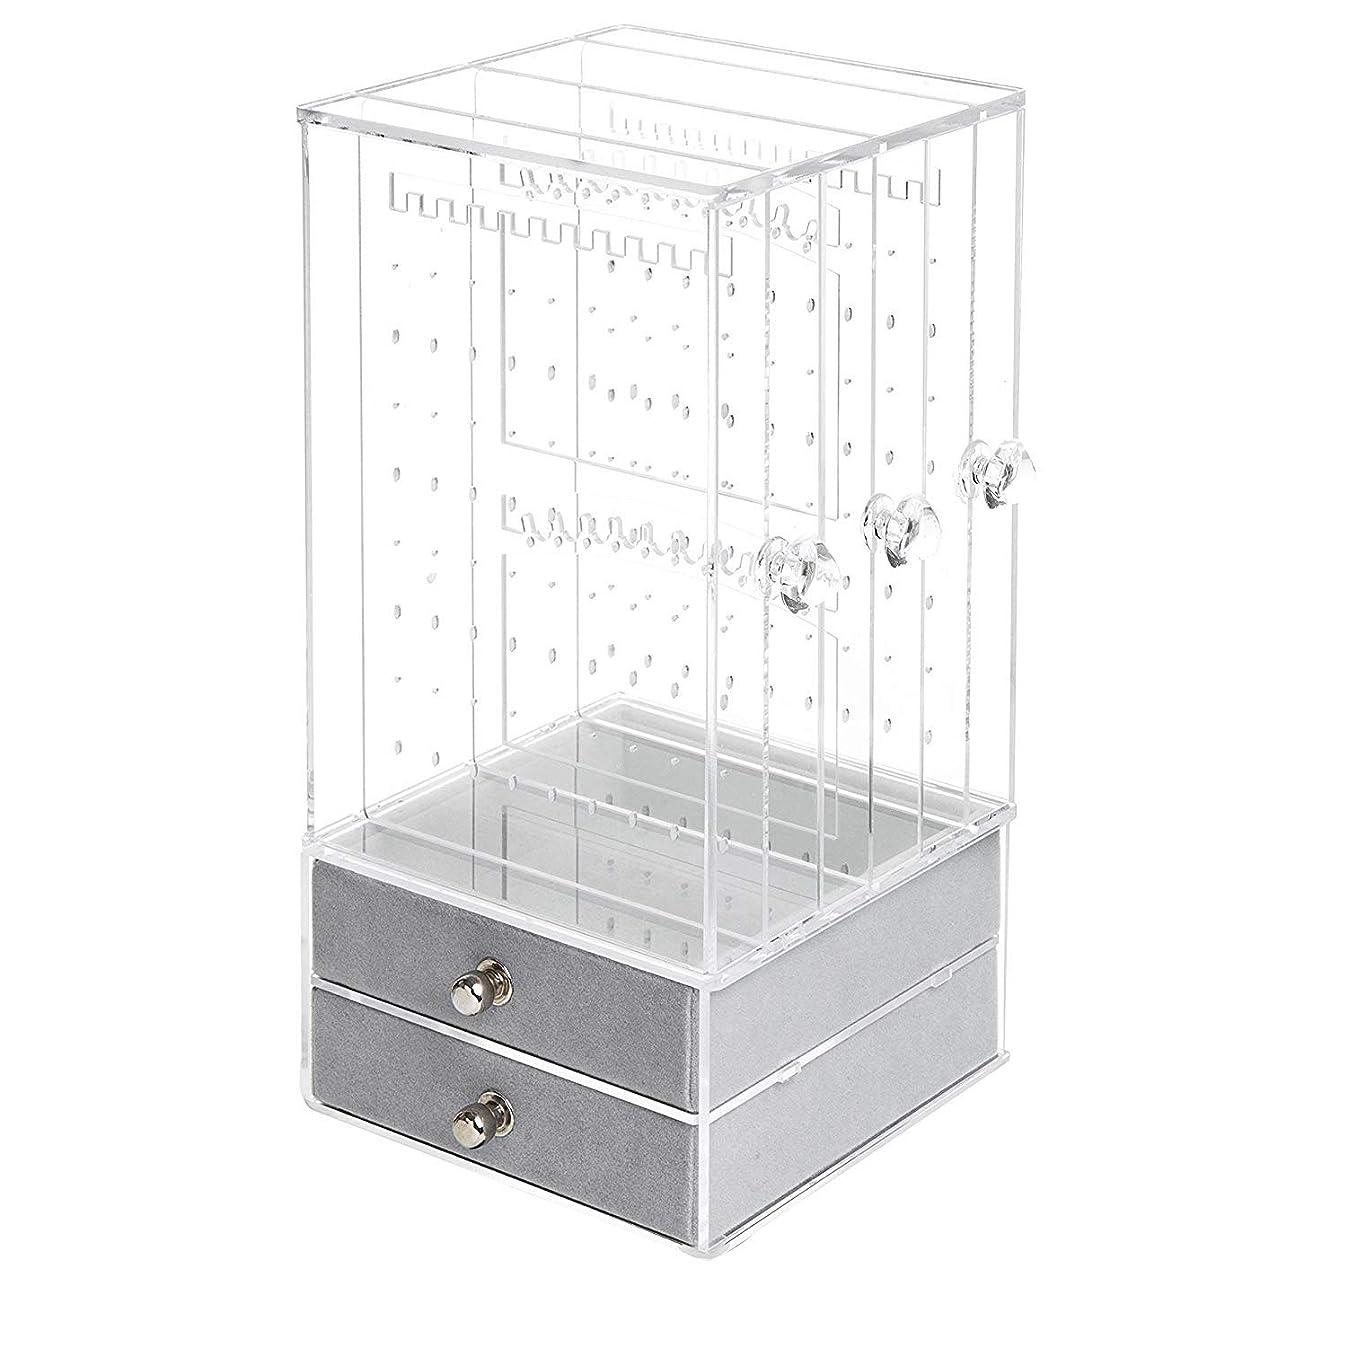 ZEYU HOME Jewelry Organizer Necklace Earrings & Bracelet Hanger Acrylic Display Storage Case Decor Gifts for Women (Clear)